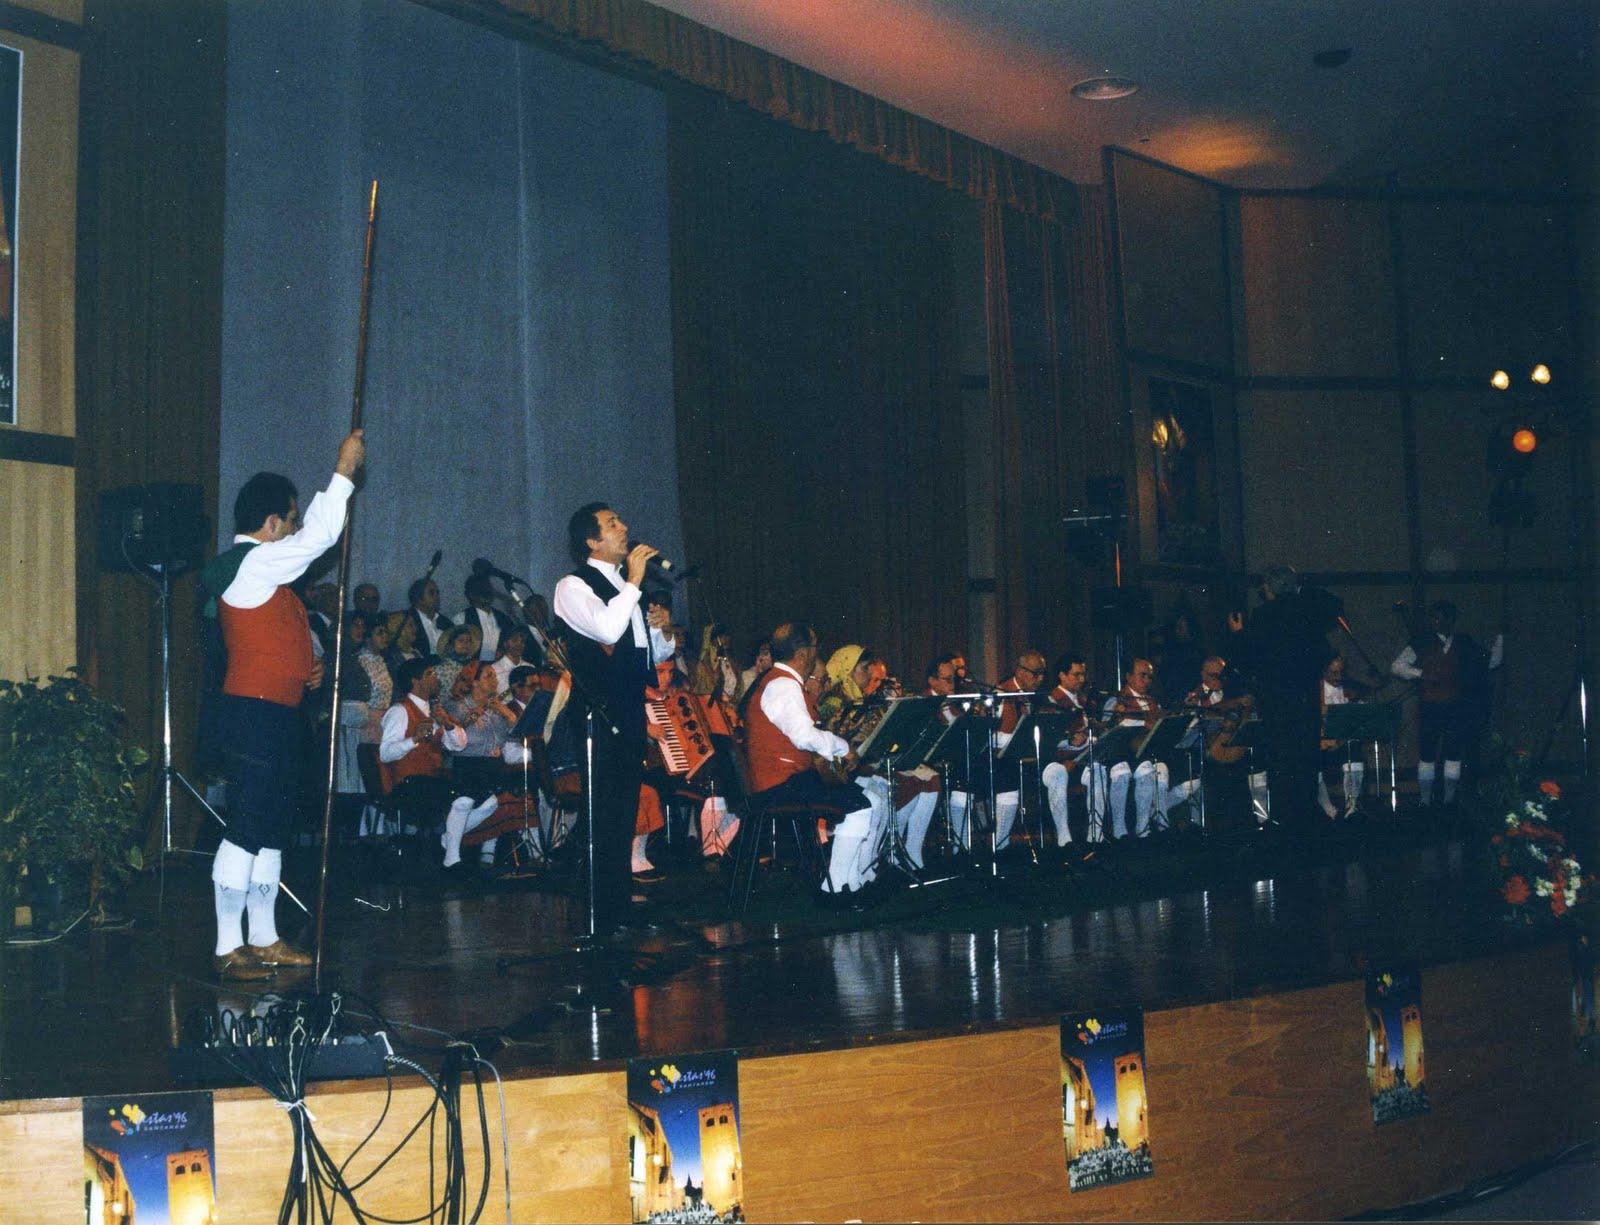 Orquestra Típica Albicastrense Chapéu Preto